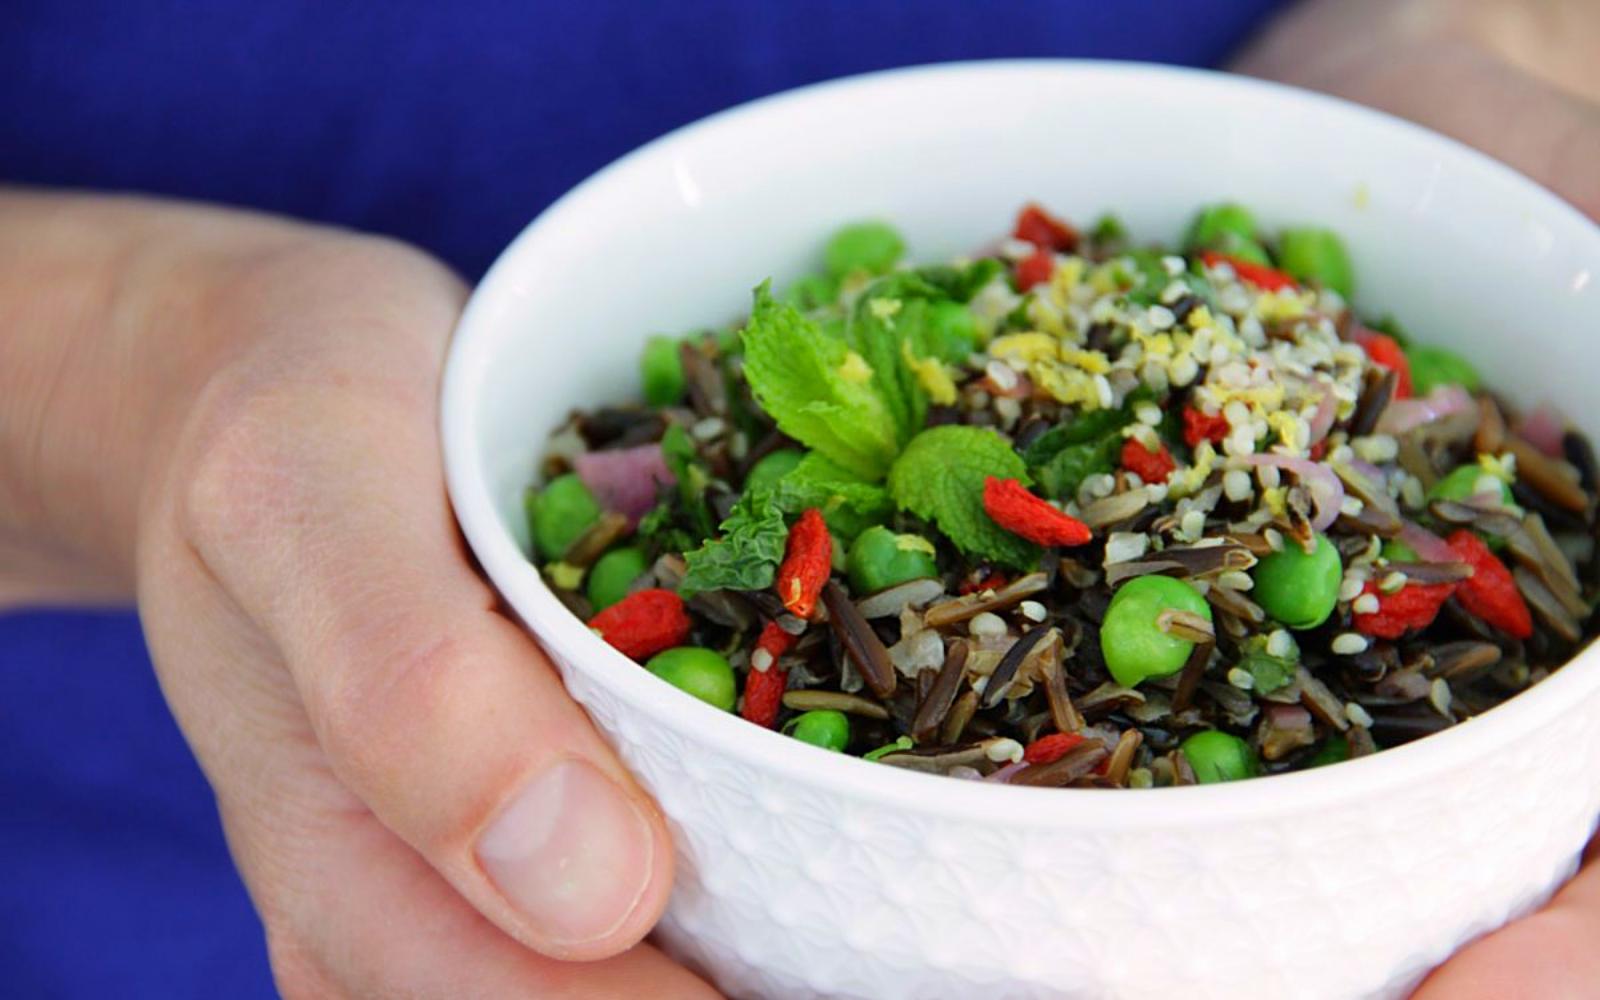 Vegan Gluten-Free Goji and Wild Rice Bowl mixed together with garnish